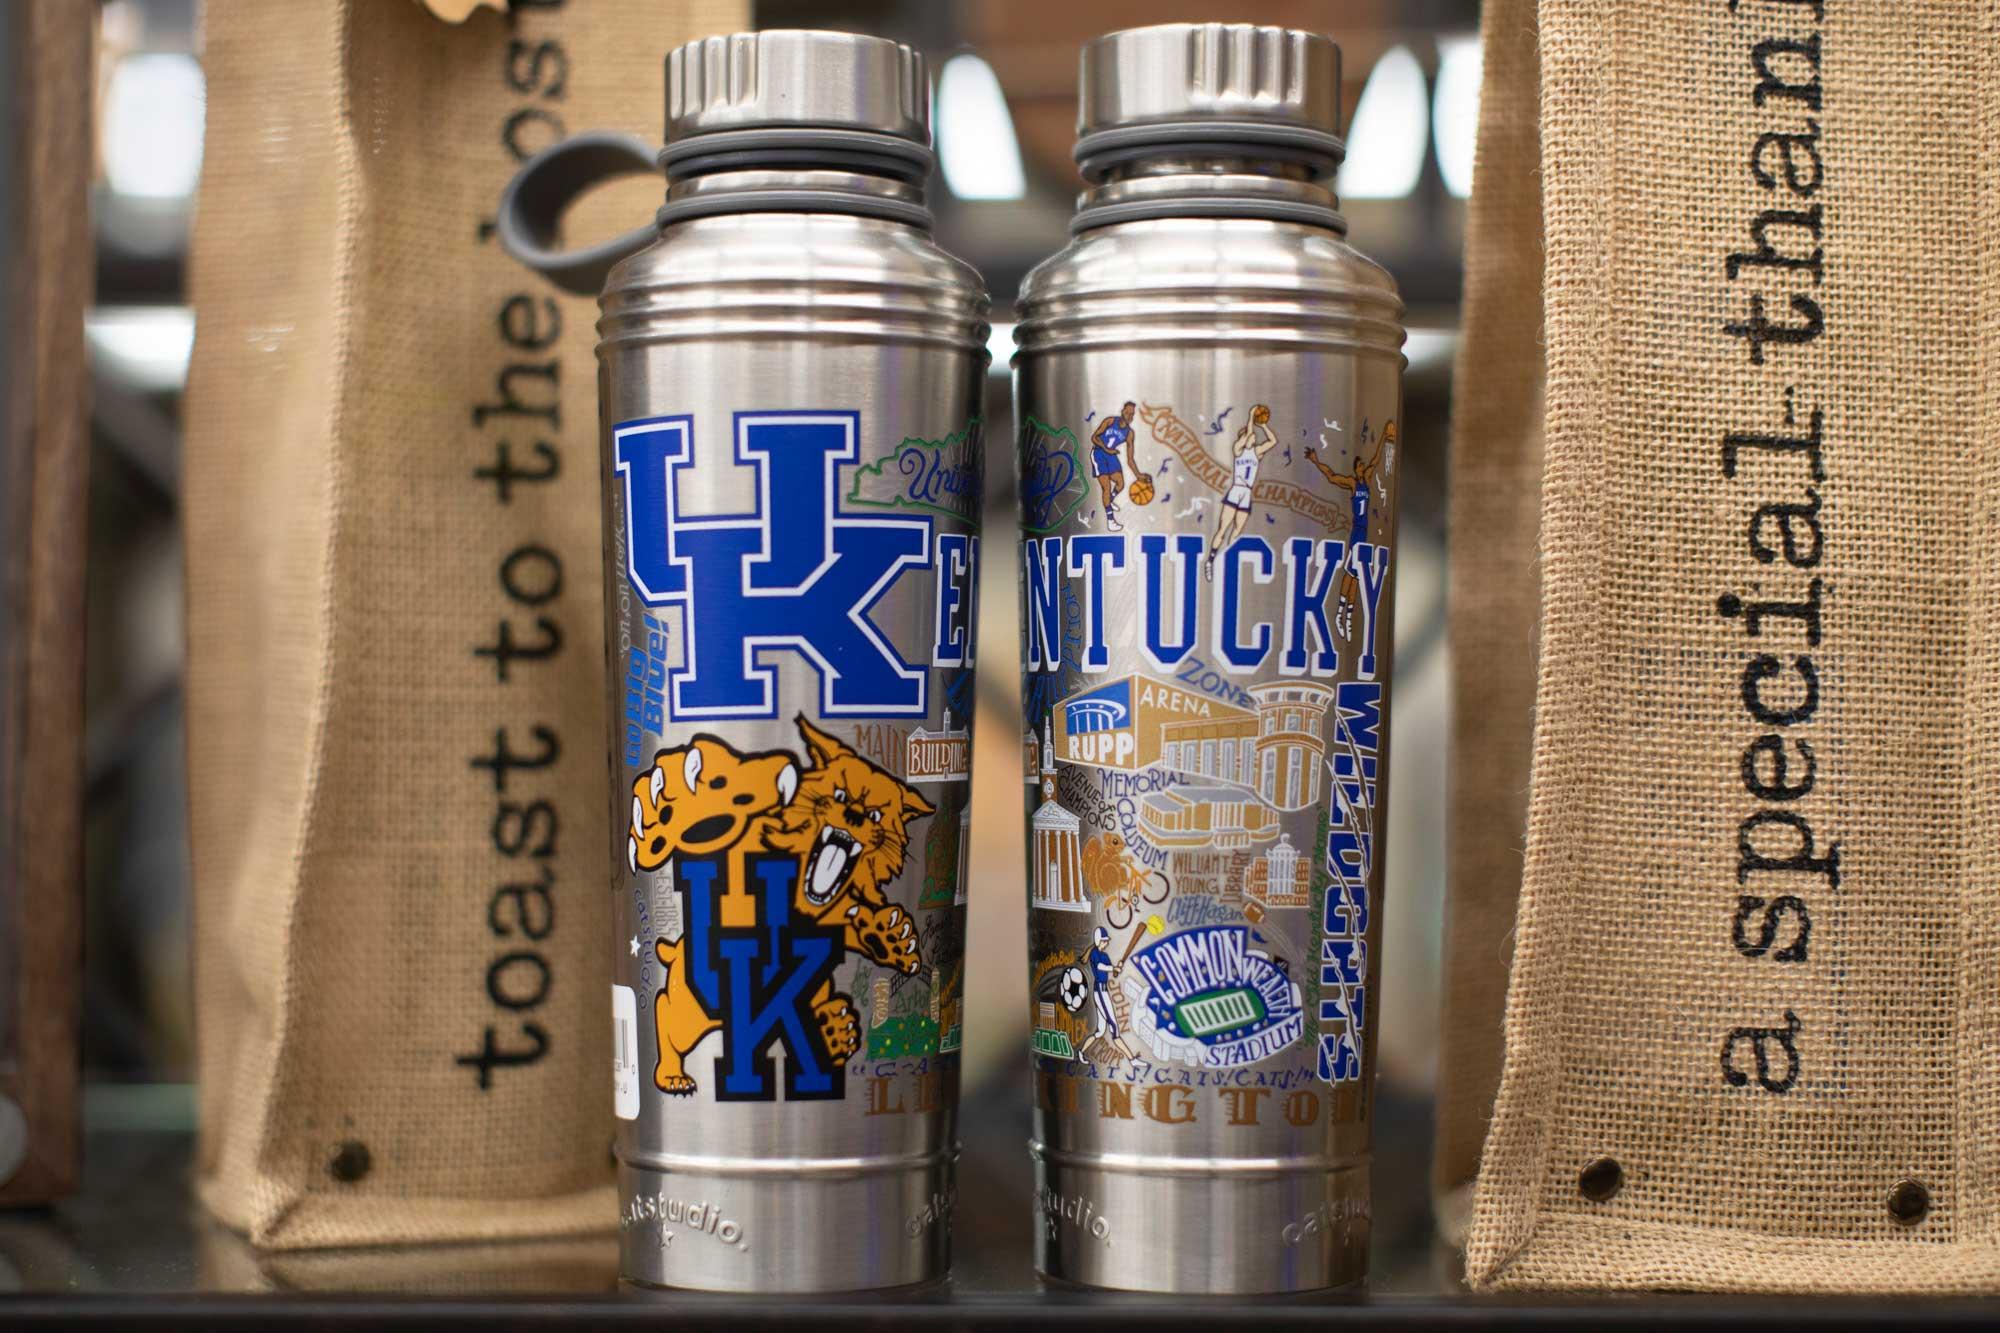 UK Kentucky thermos